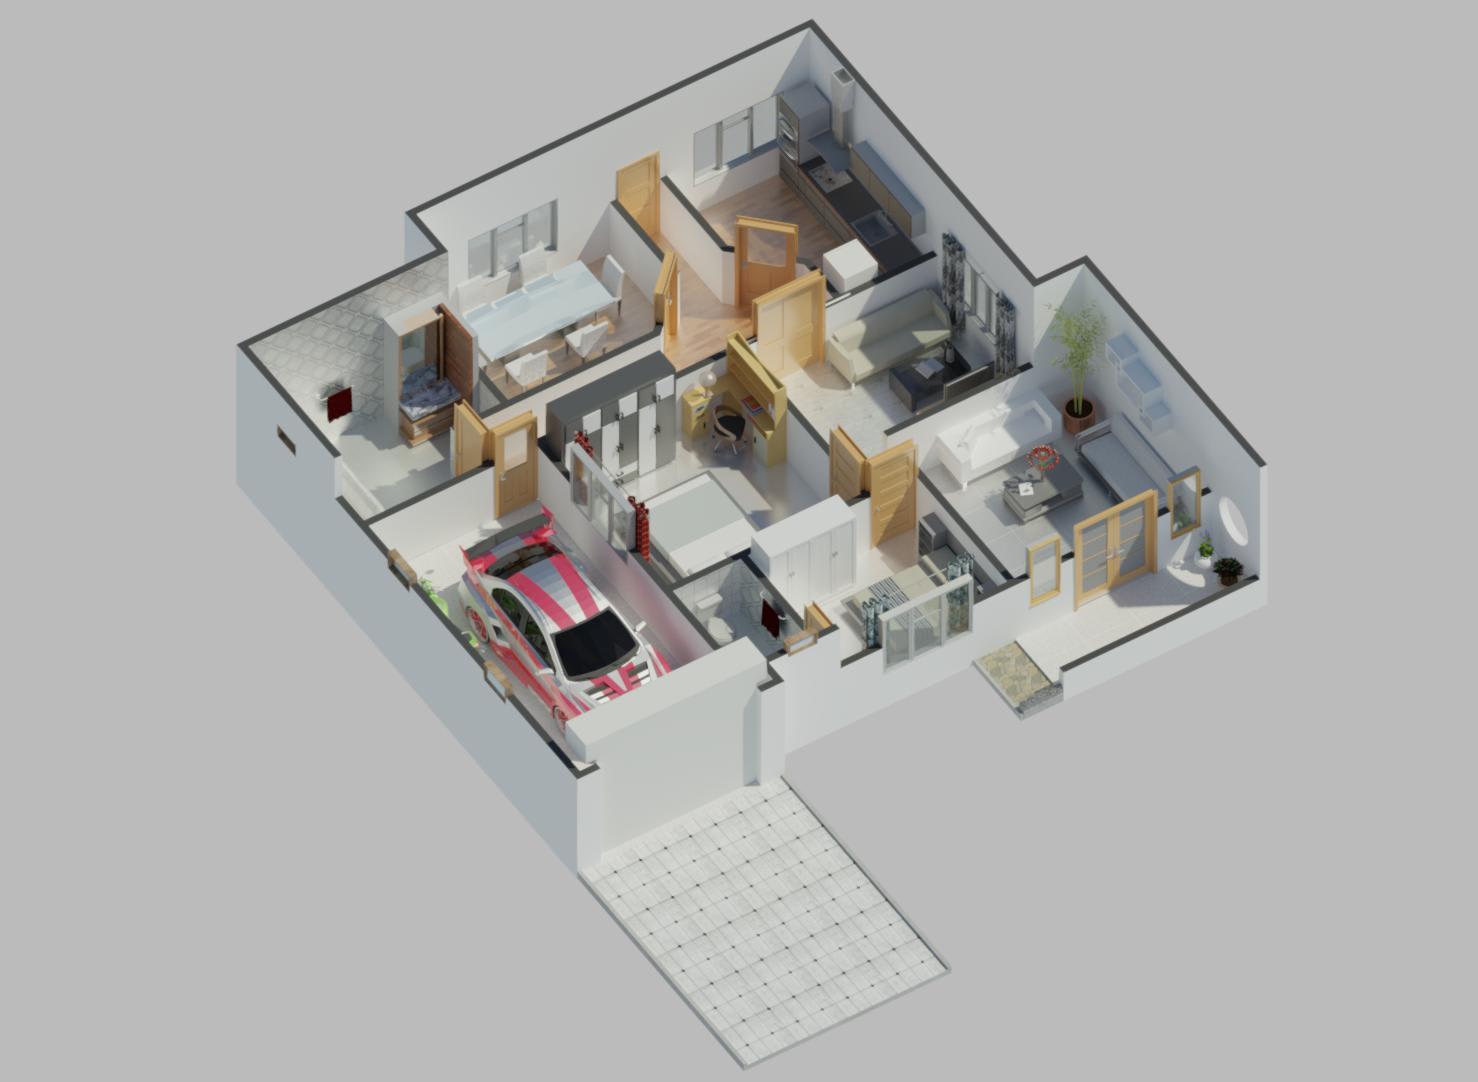 Create 3d Floor Plans 2d Floor Plans With Hq Renders By Bravo6goingdark Fiverr